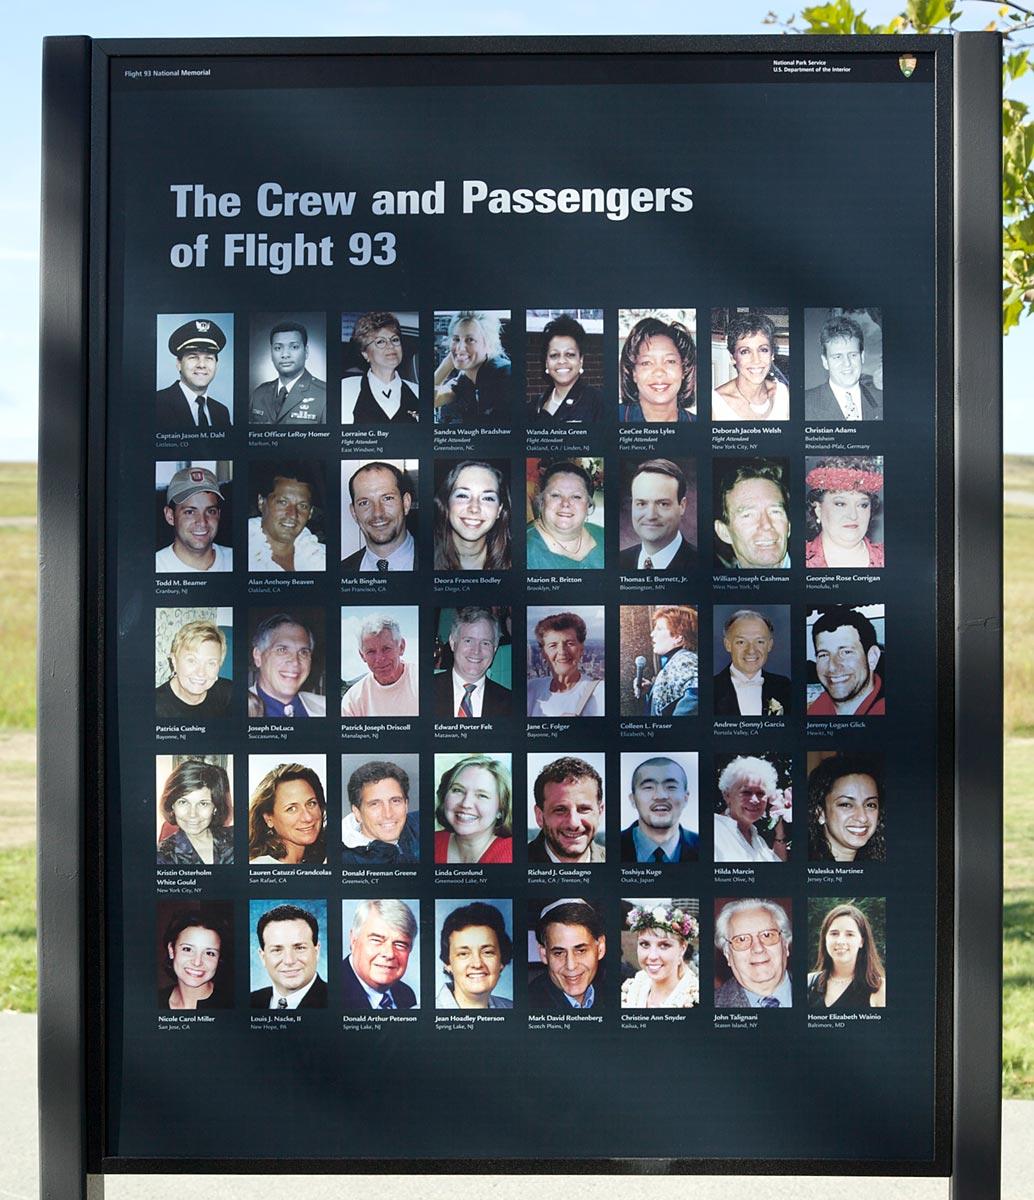 Images of Flight 77 Passengers - #SpaceHero